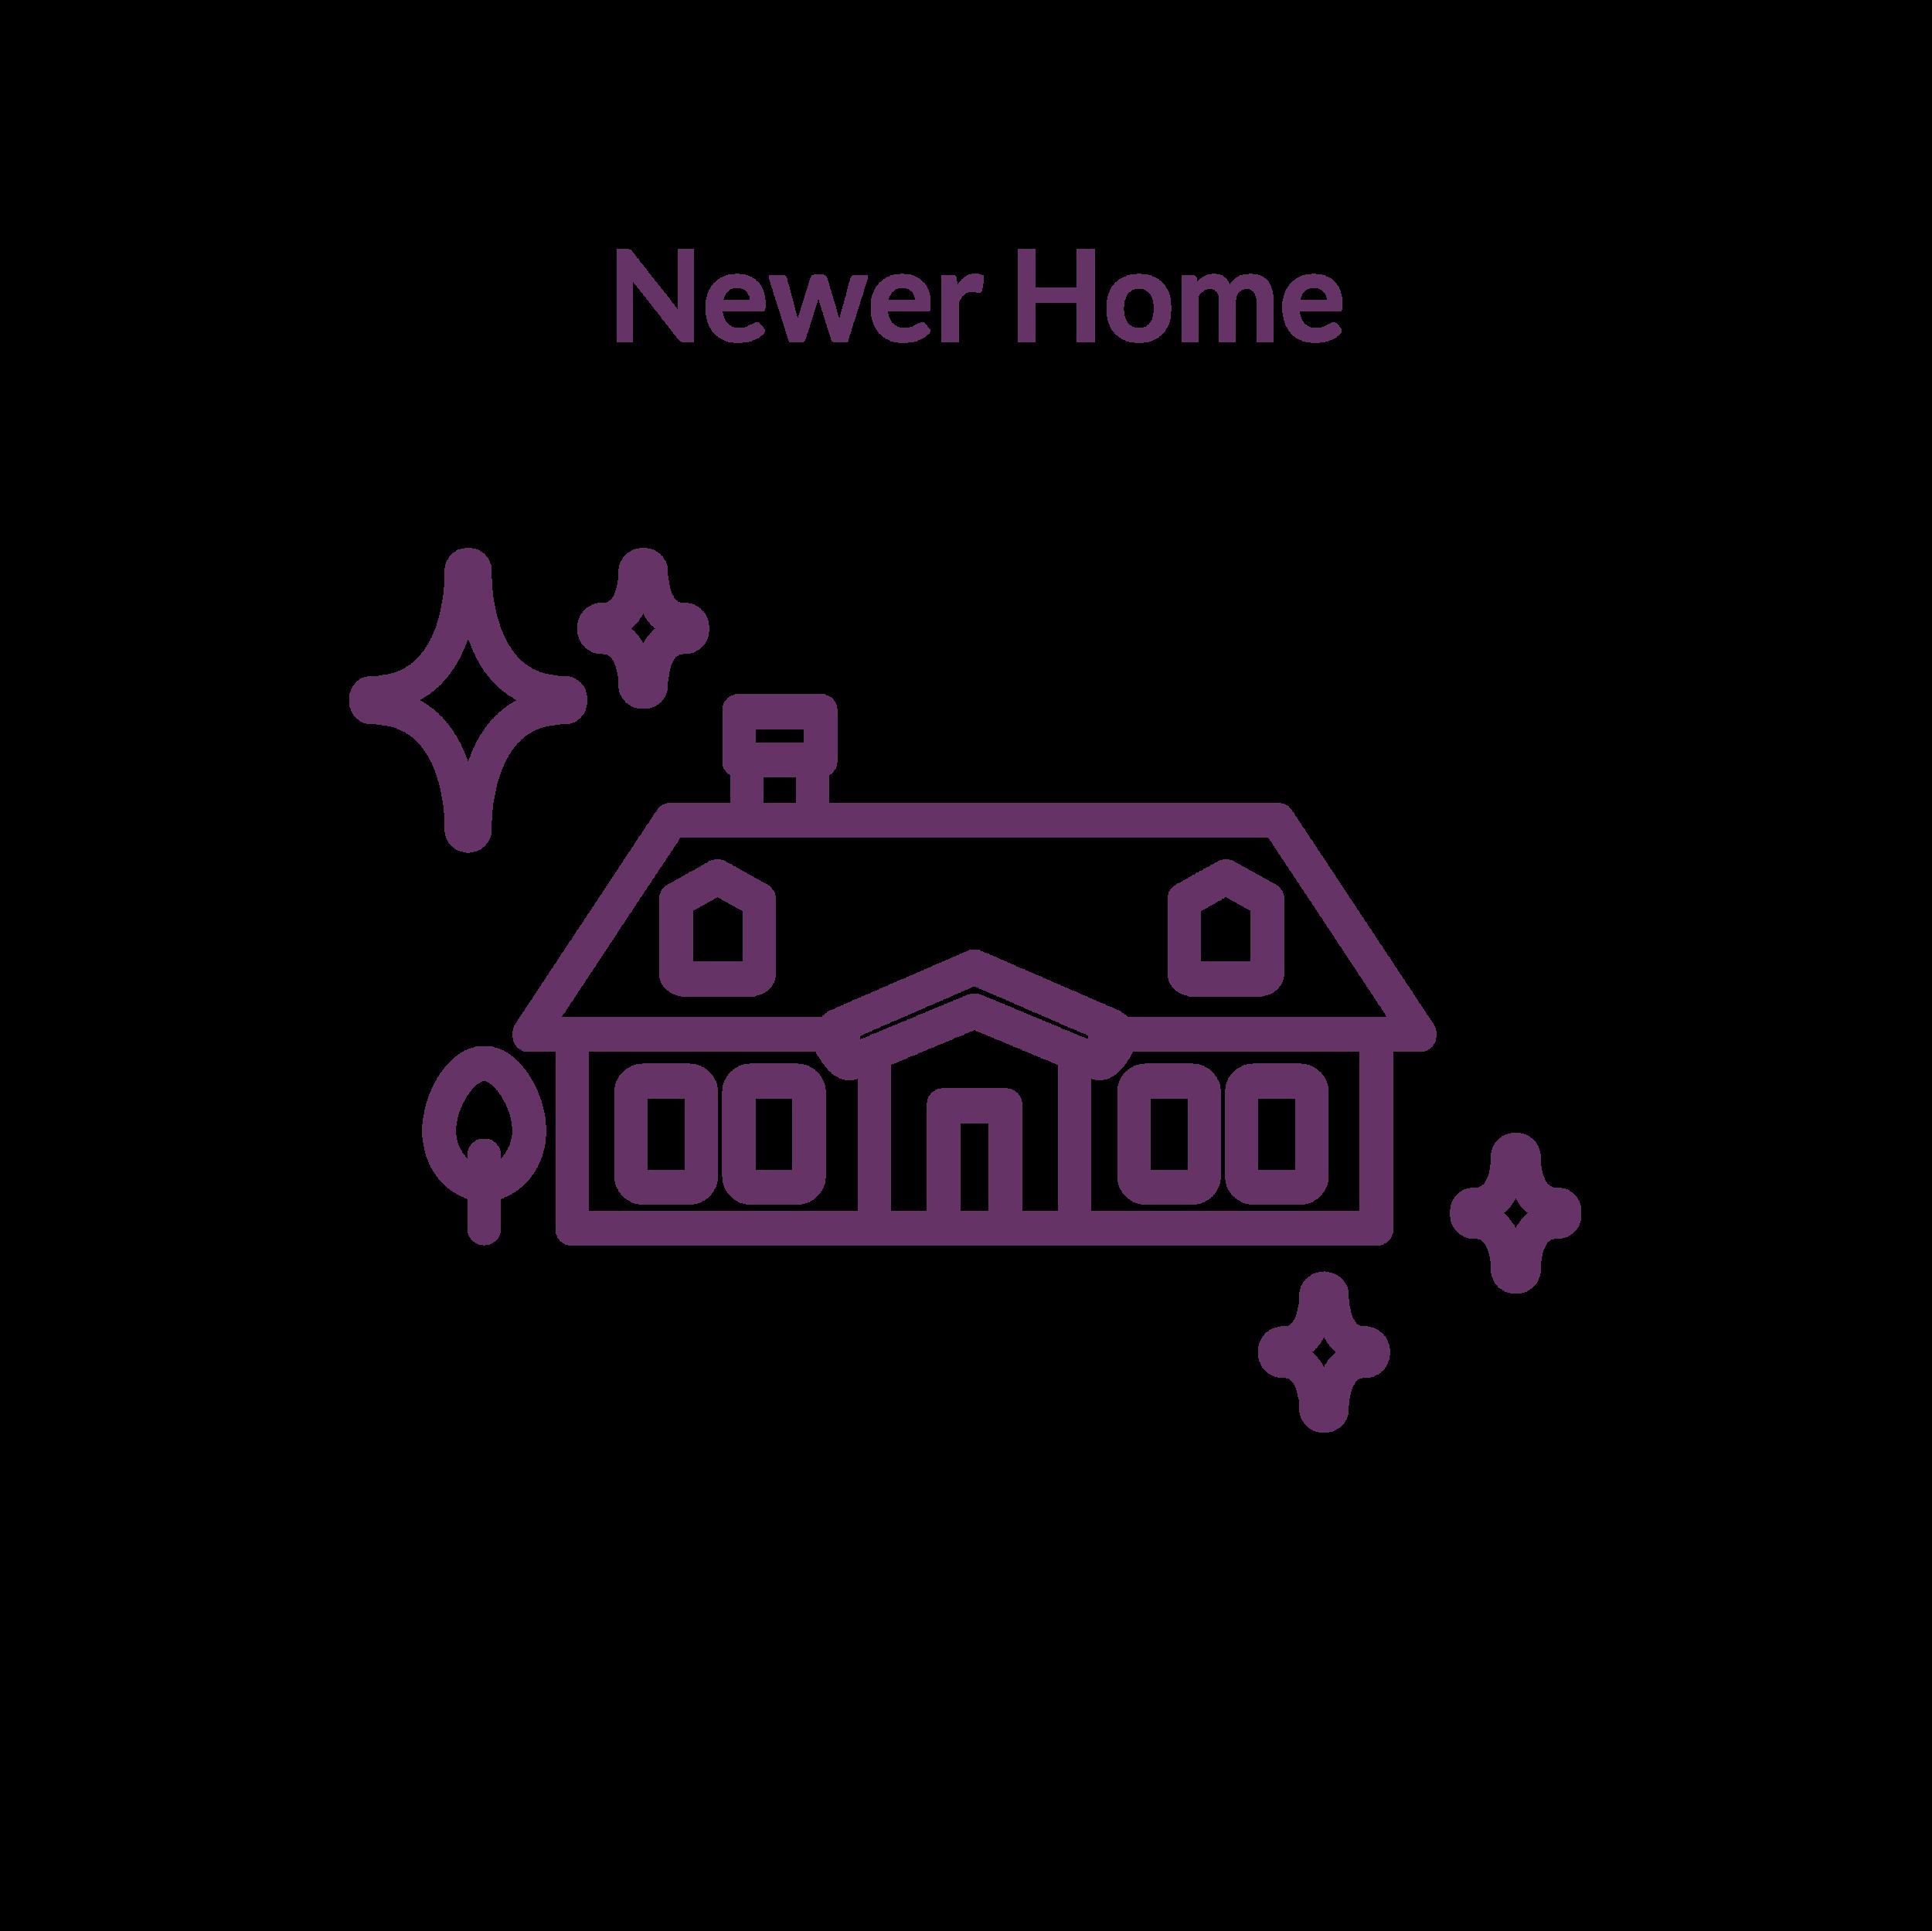 Newer home